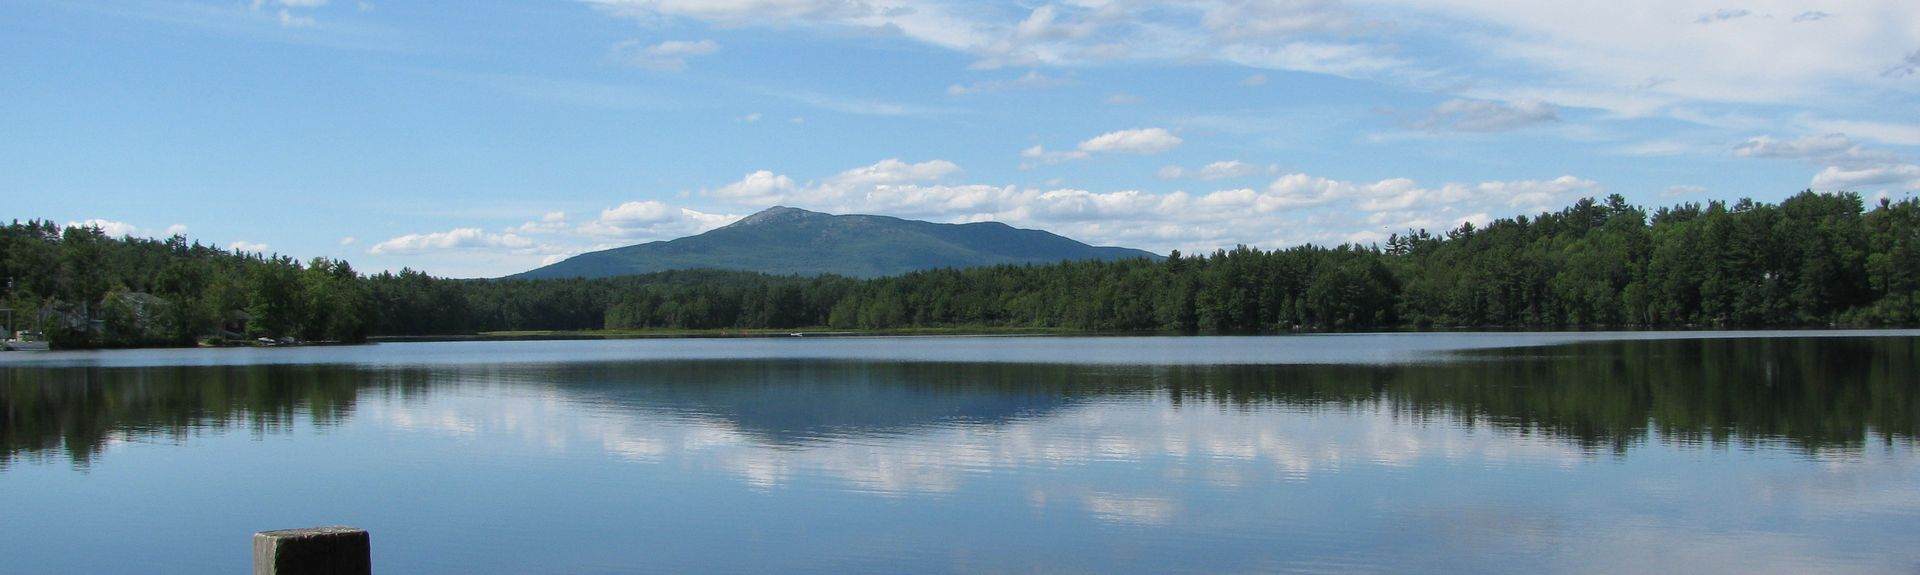 Peterborough, New Hampshire, USA